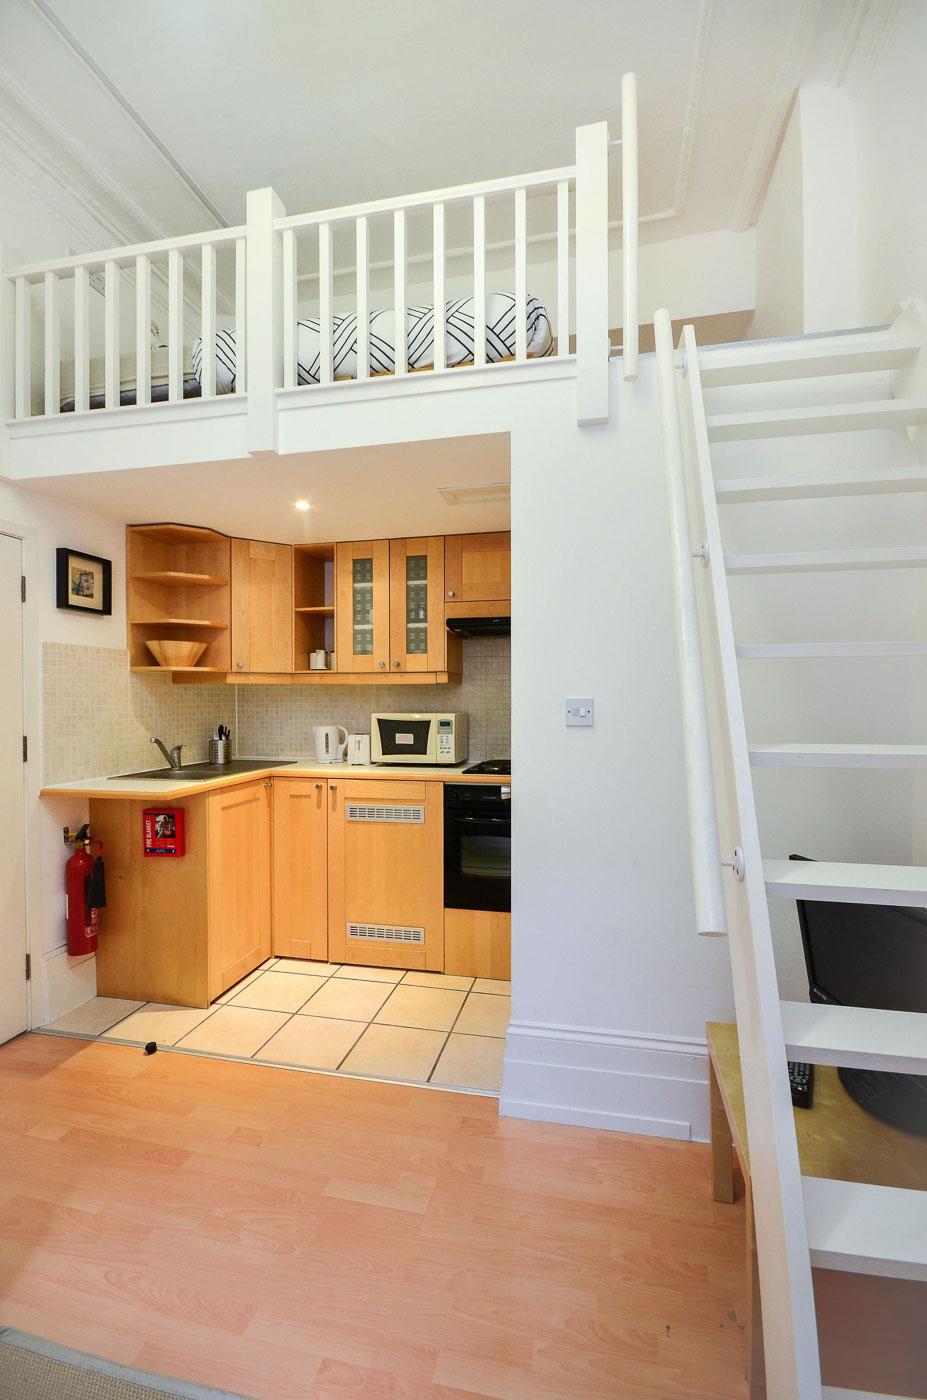 London studio flat